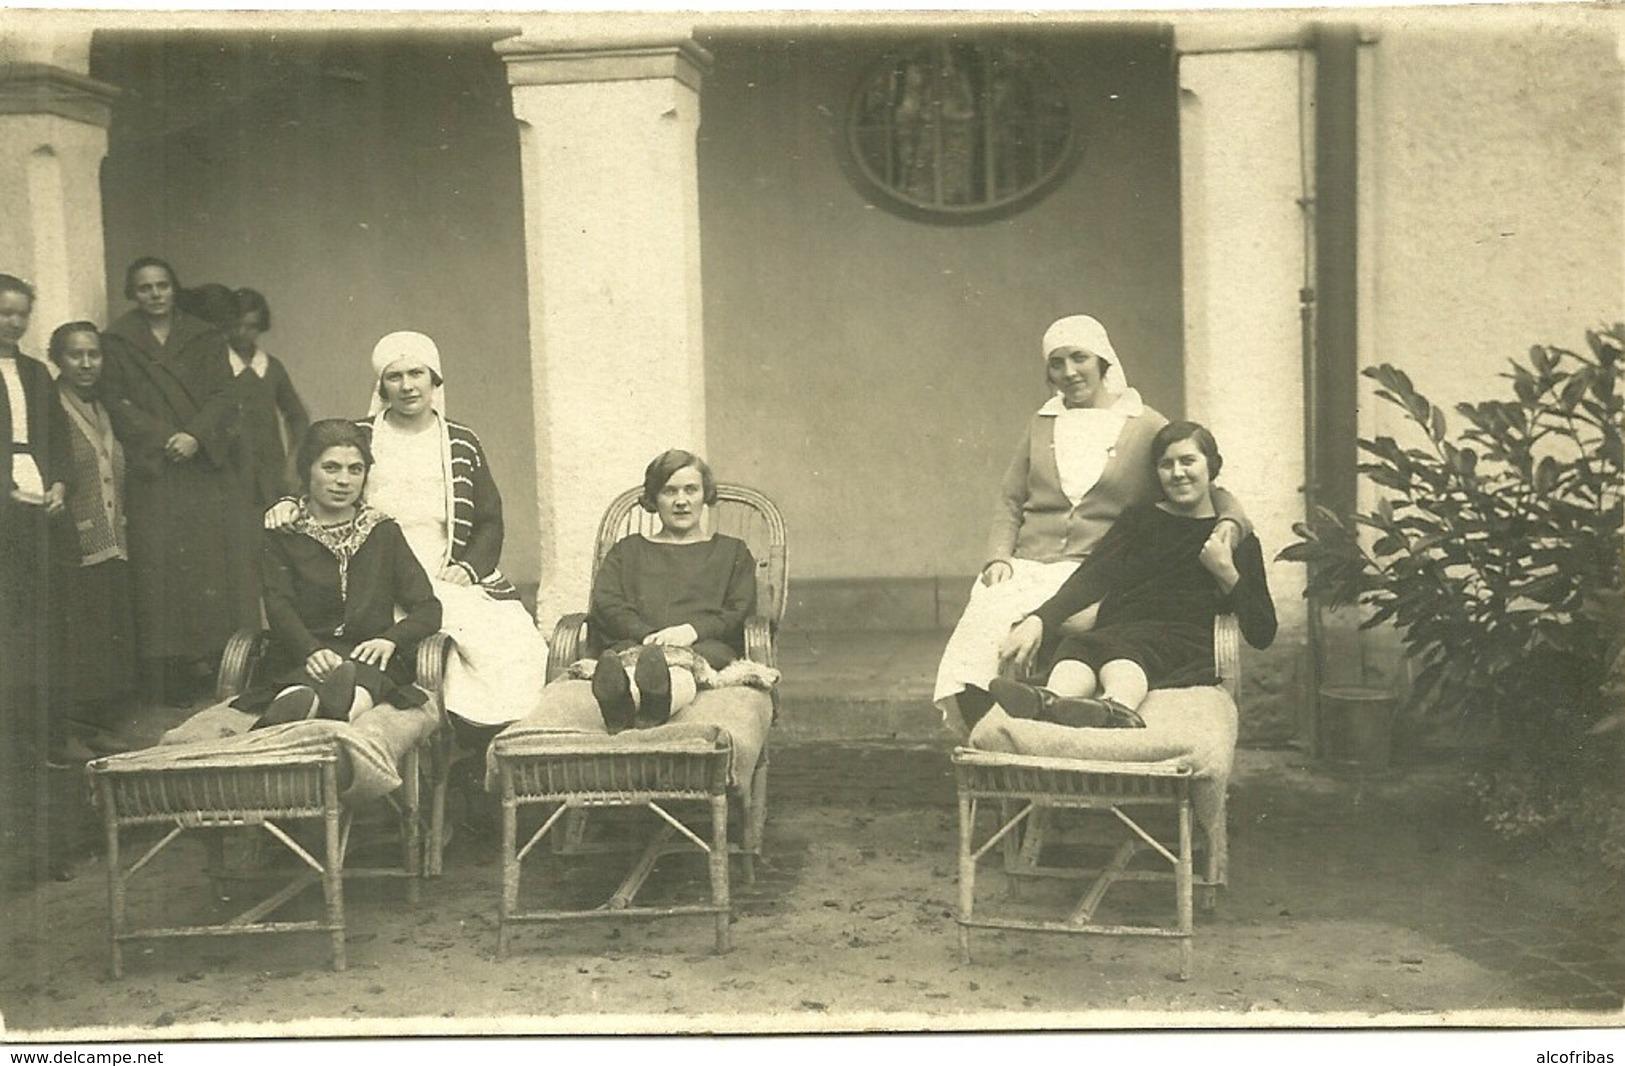 57 Cpa Photo Medecine Soins Cure Hopital Femmes En Convalescence Photo Kroenner Bouley - Salute